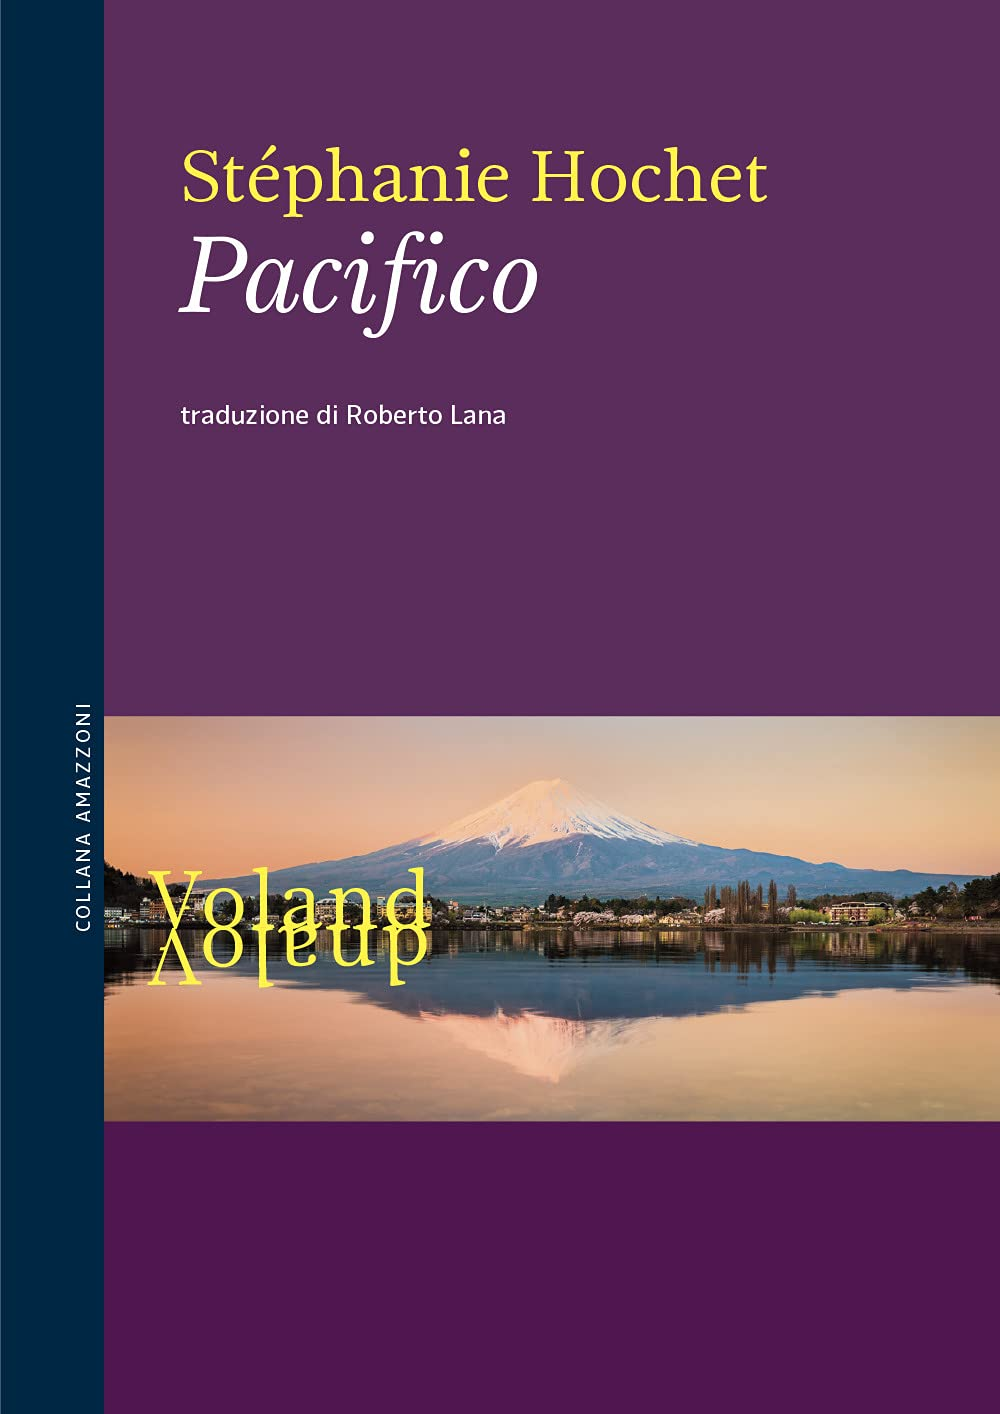 Recensione di Pacifico – Stéphanie Hochet